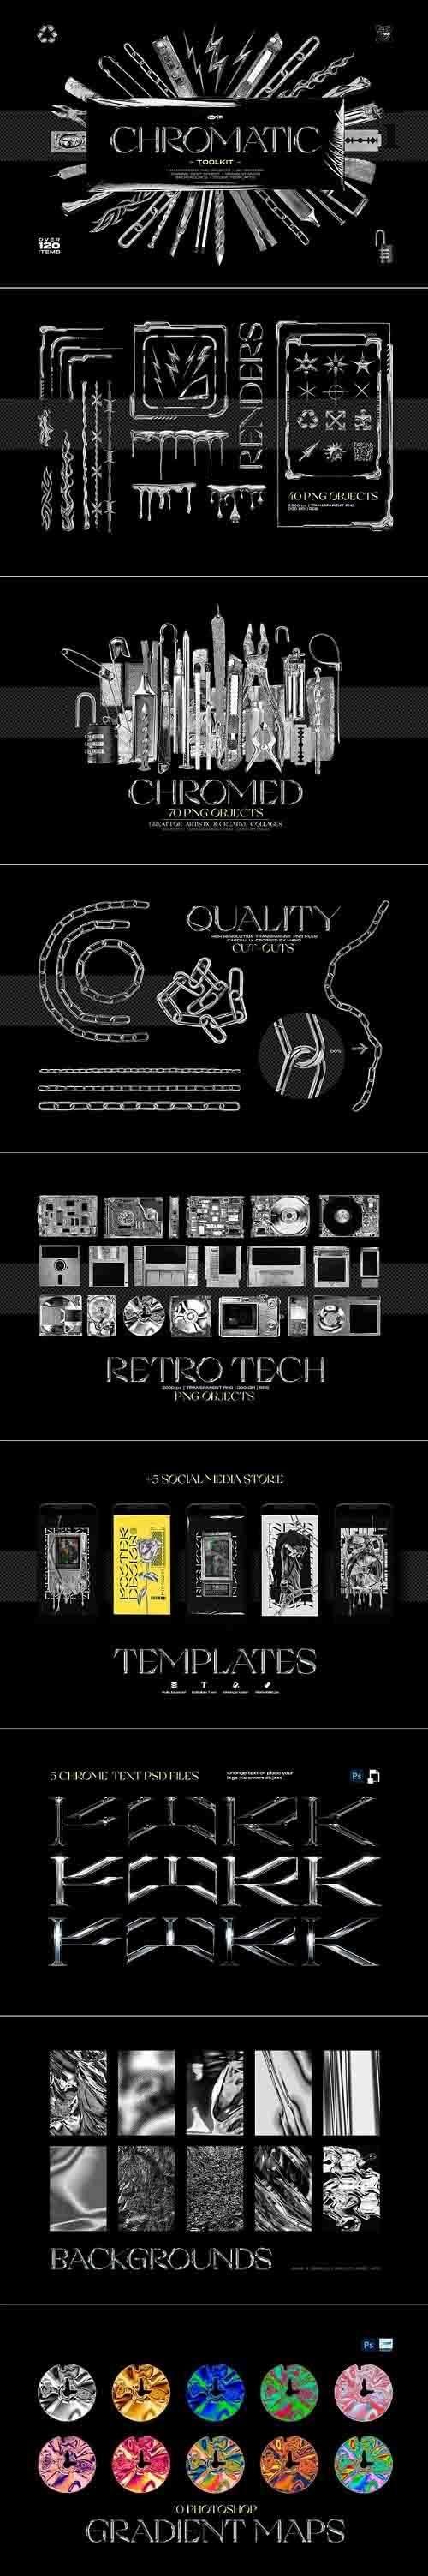 CreativeMarket - Chromatic Toolkit 5743691